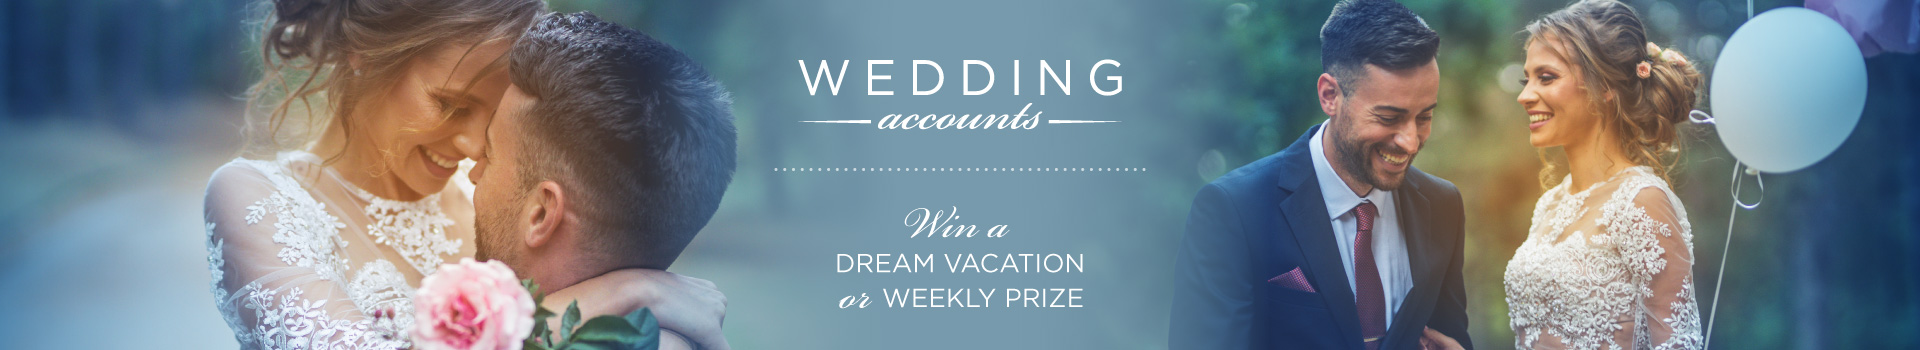 Wedding Savings Account